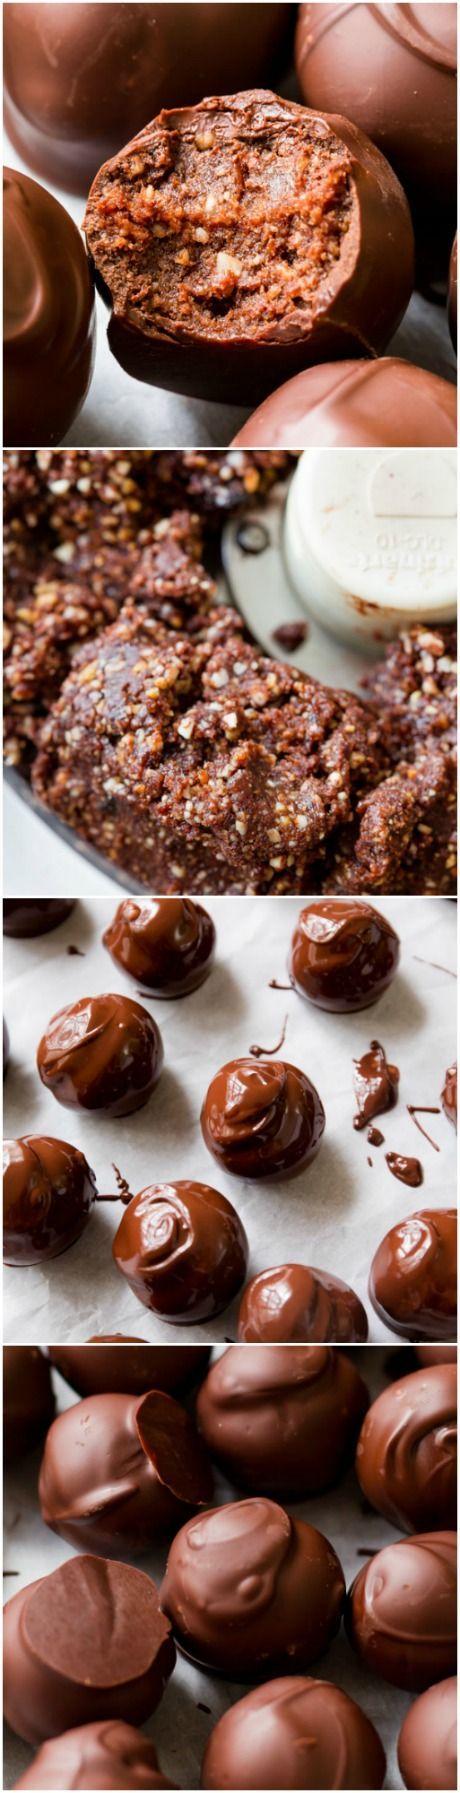 Seriously! HEALTHY truffles made with dark chocolate. Easy recipe found on sallysbakingaddiction.com